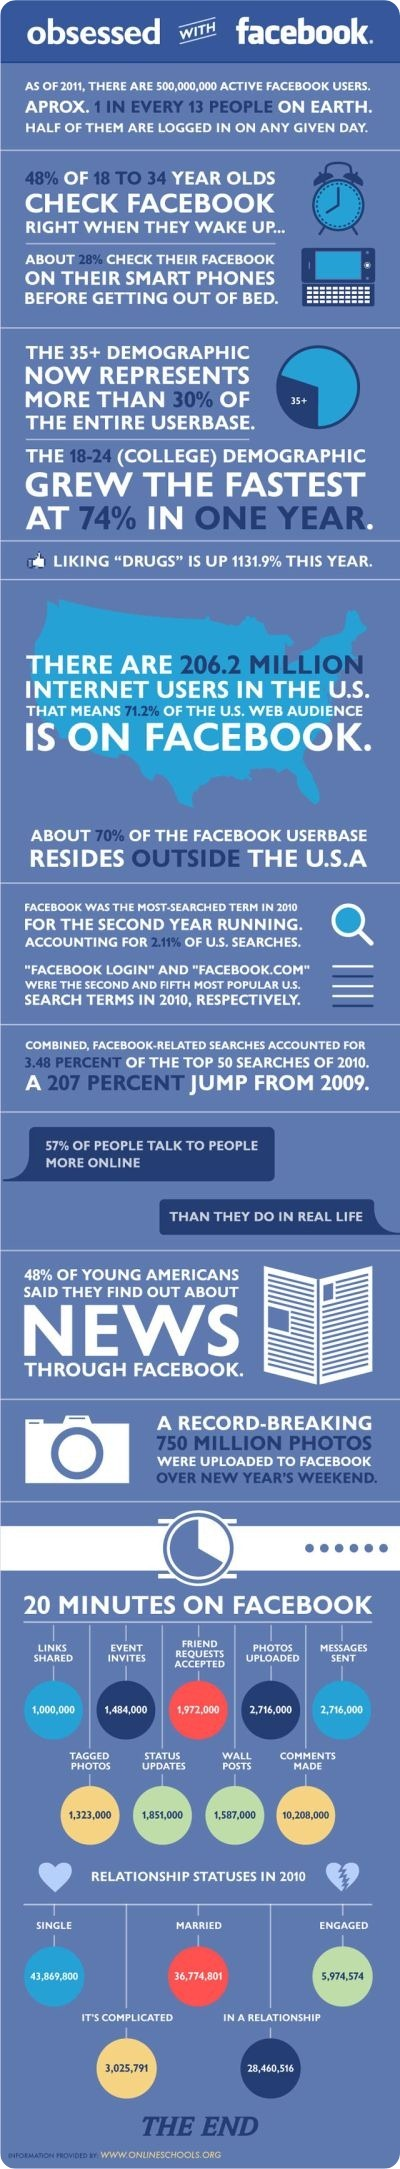 facebook_obsedded_long